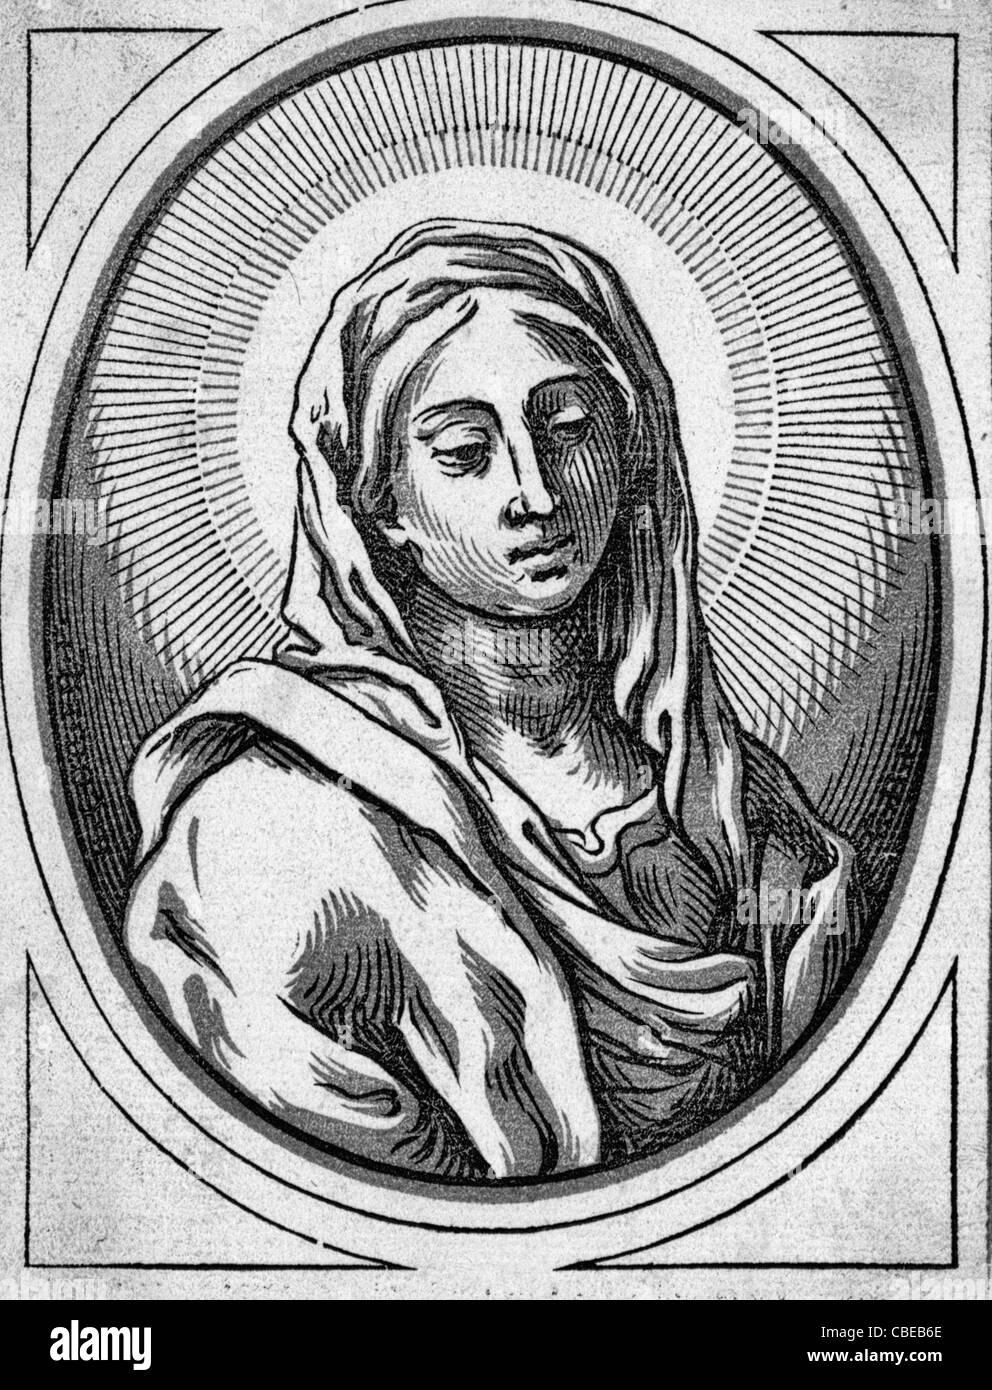 Kopf der Jungfrau - Holzschnitt des Kopfes der Jungfrau Maria Stockbild